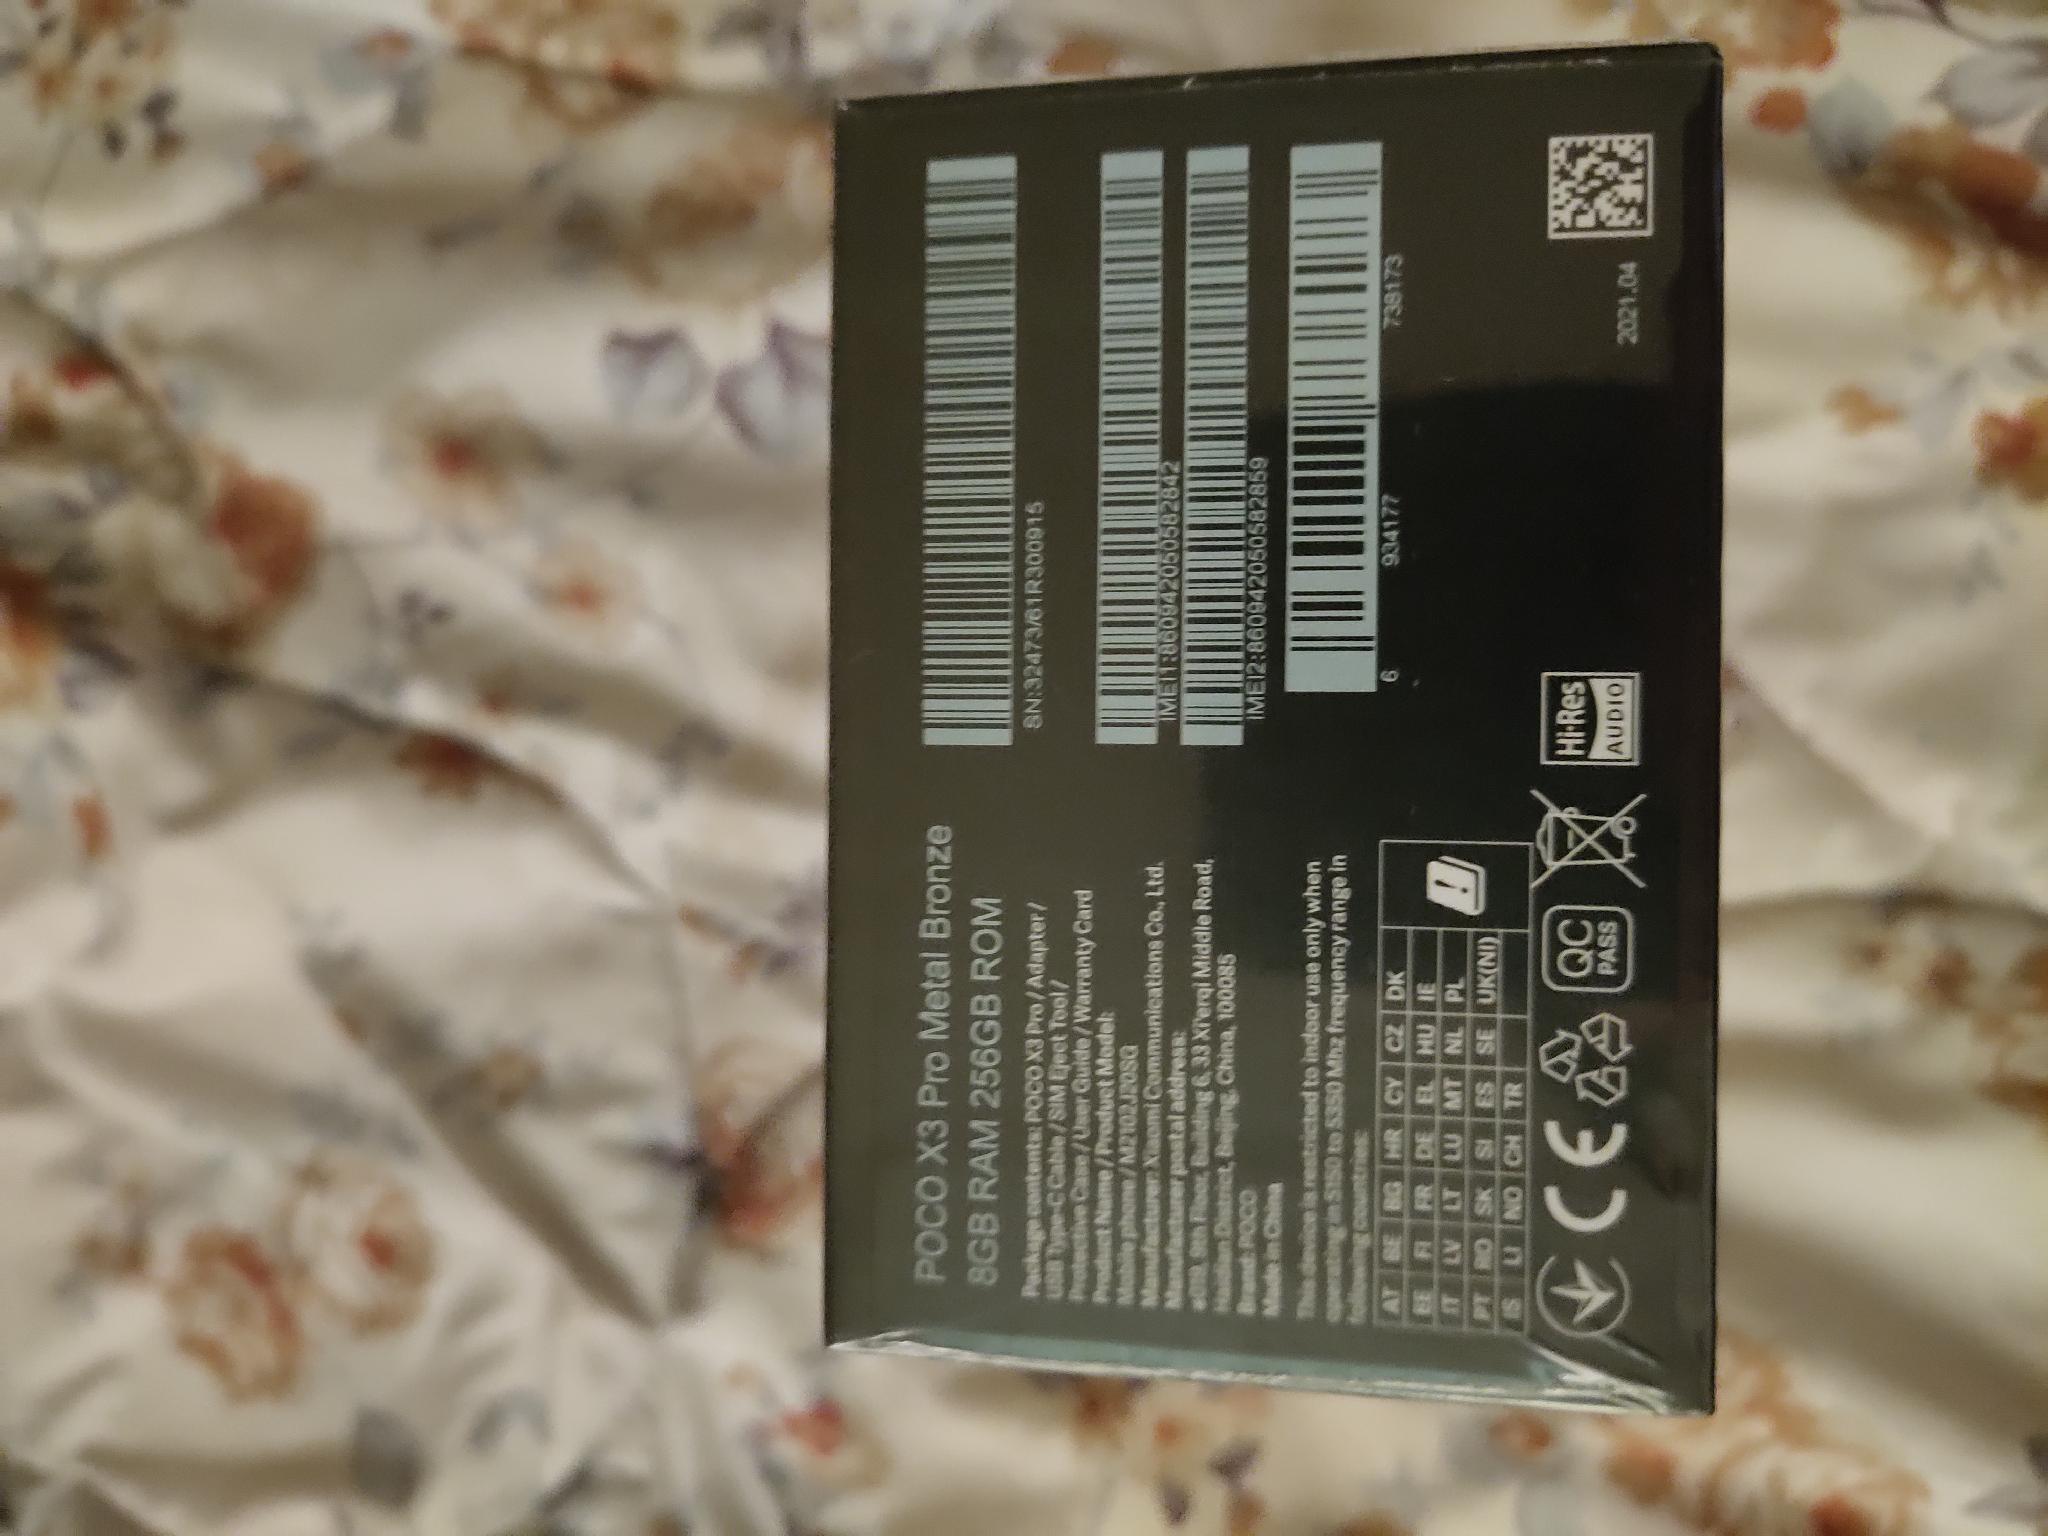 Poco X3 pro 8gb ram 256